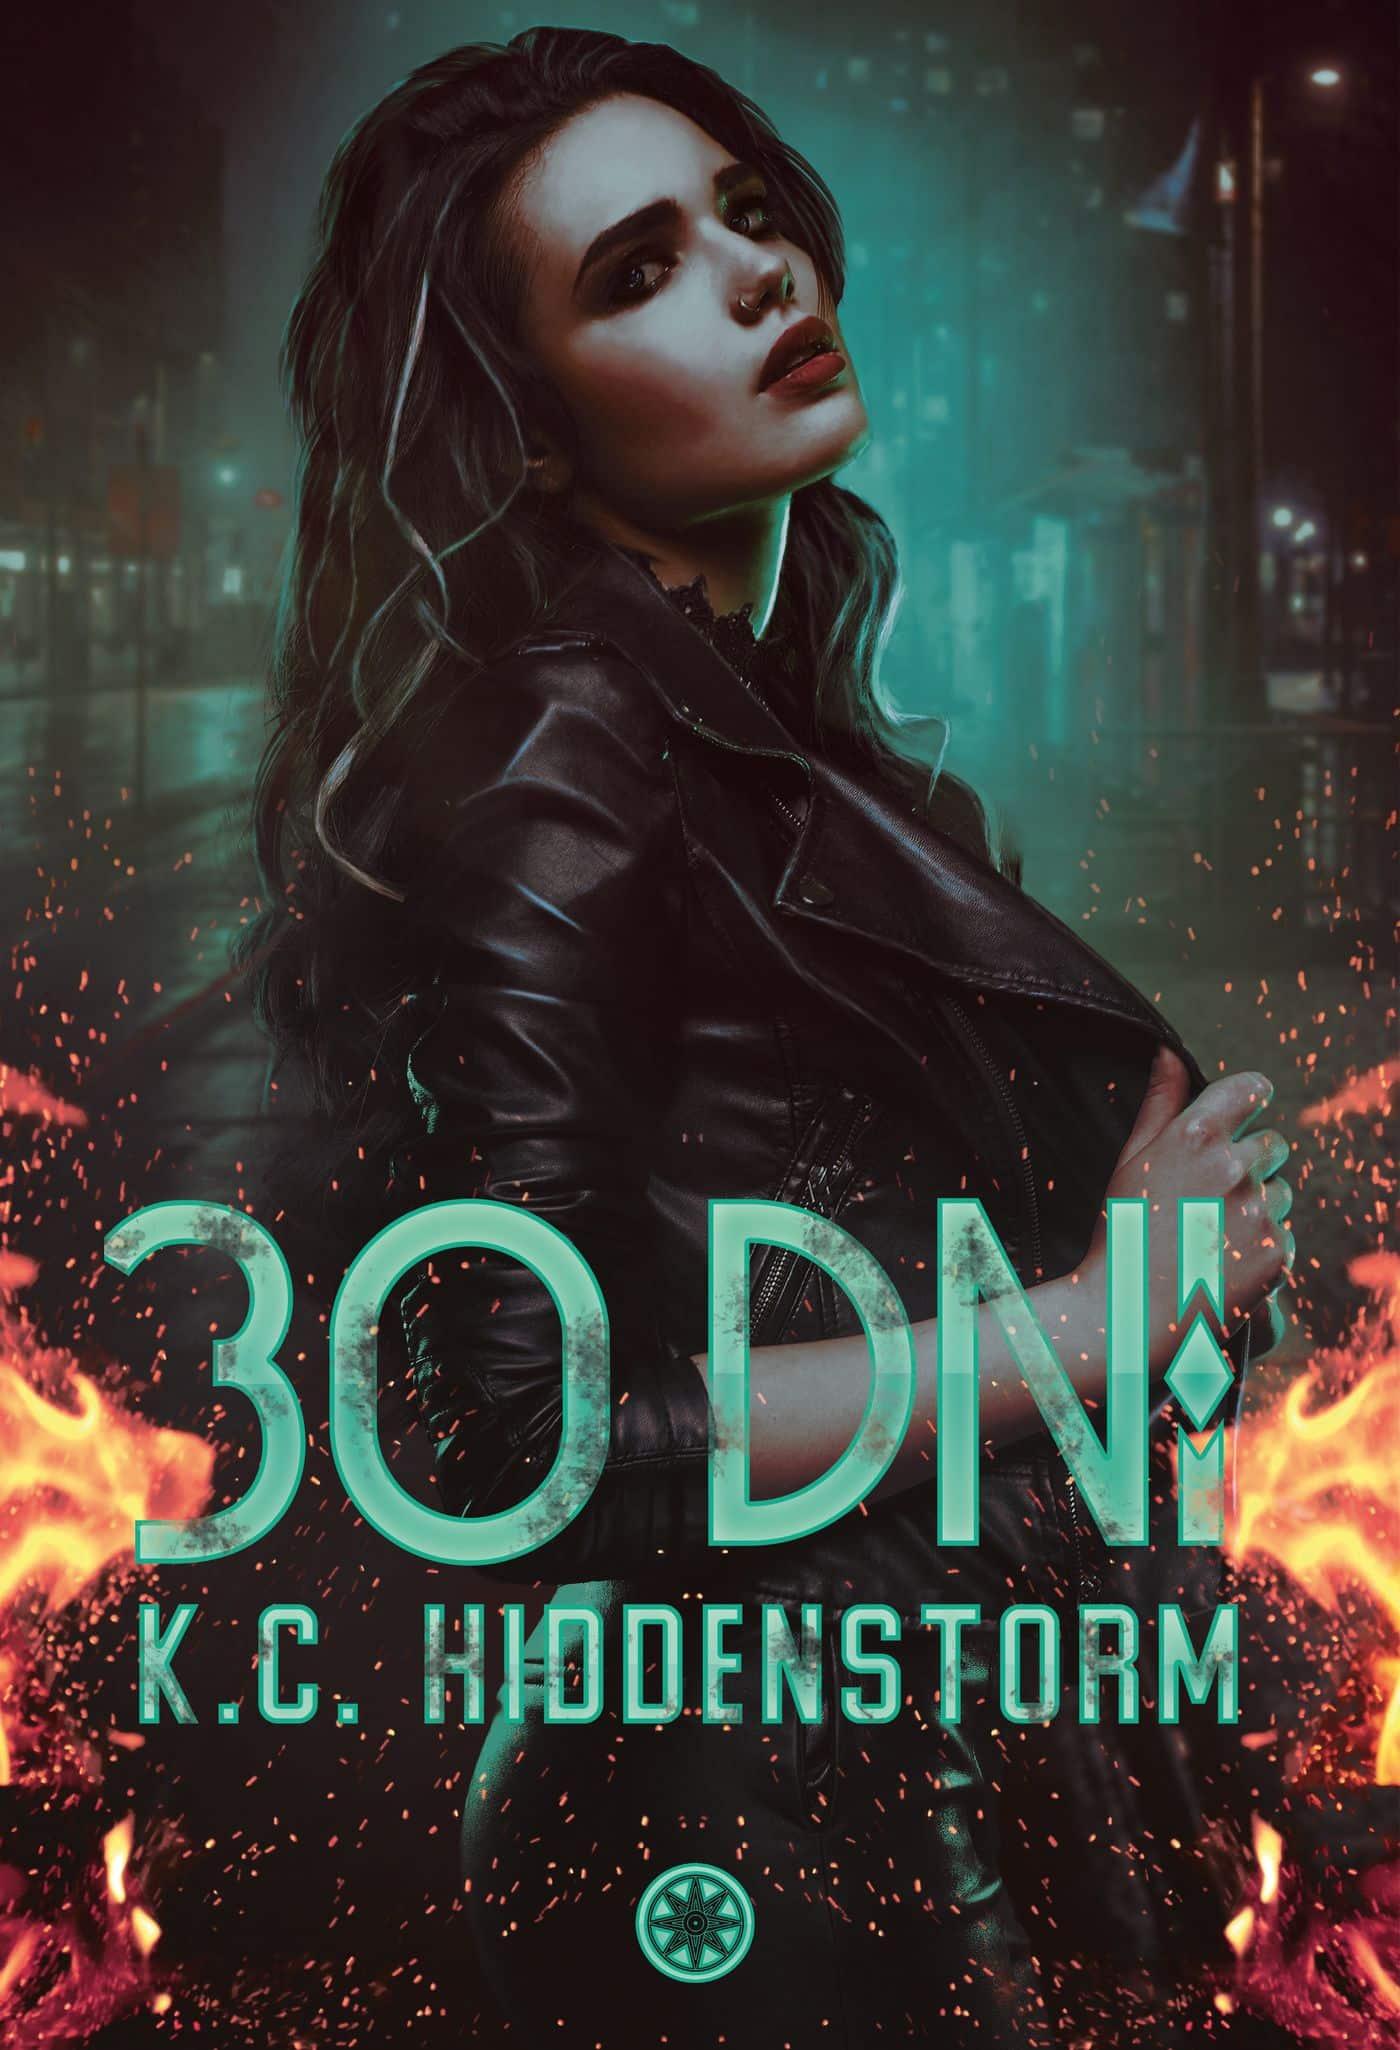 30 dni - K.C. Hiddenstorm